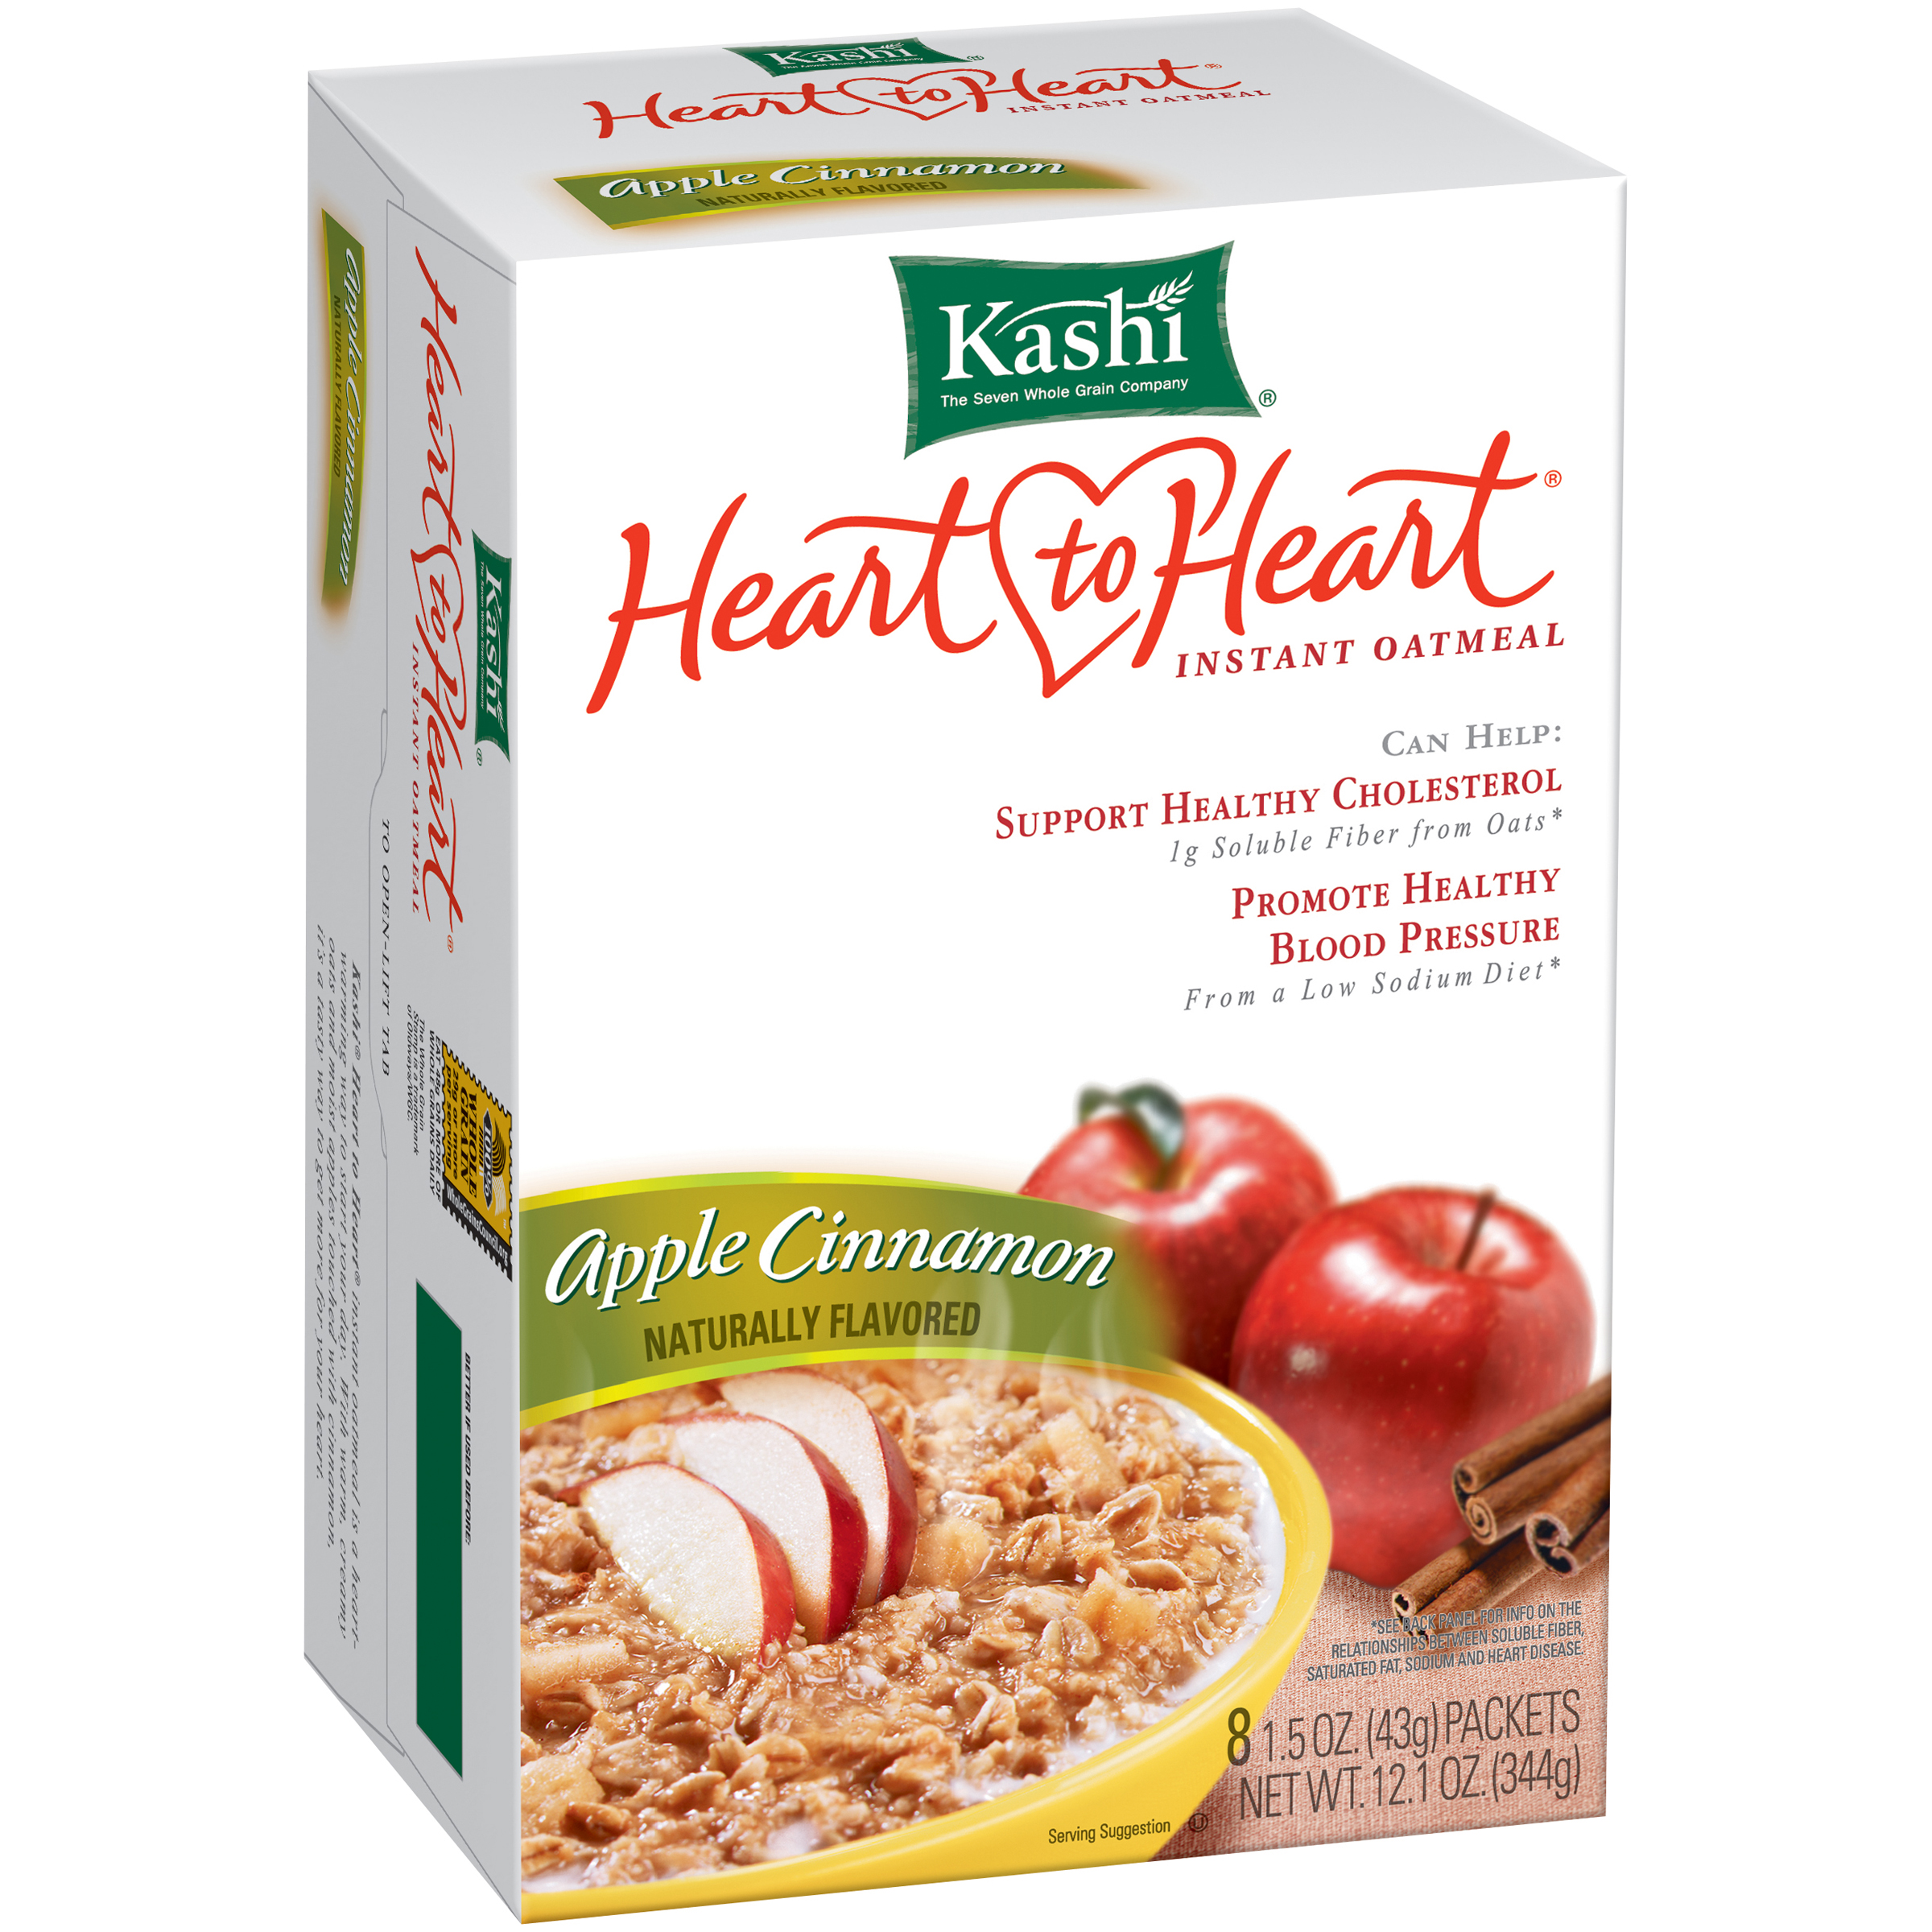 Kashi�� Heart to Heart�� Apple Cinnamon Instant Oatmeal 8-1.5 oz. Packets